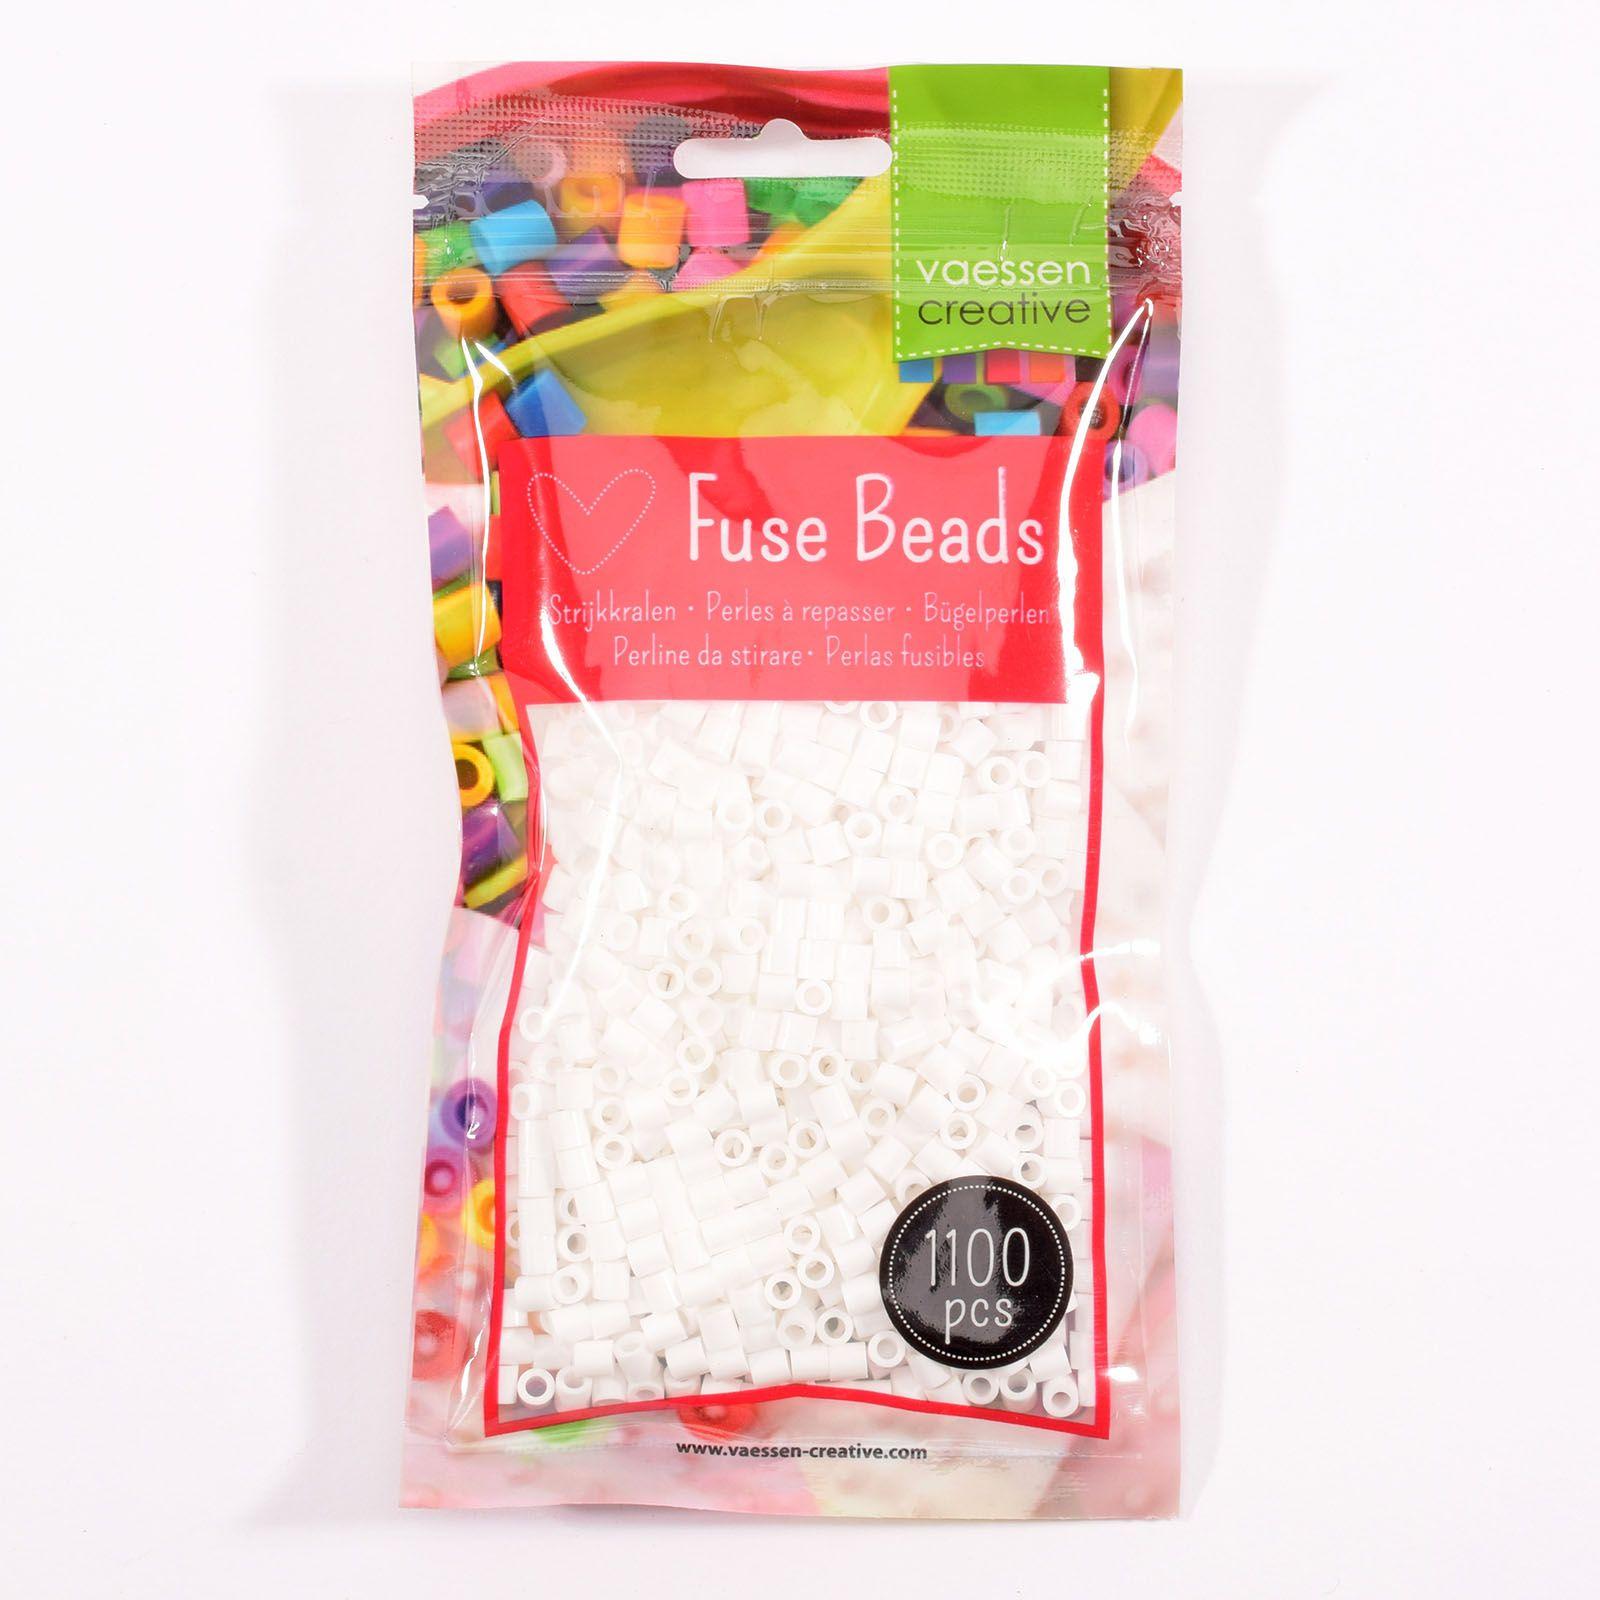 Sachet de 1100 perles à repasser - Ø 5 mm coloris blanc